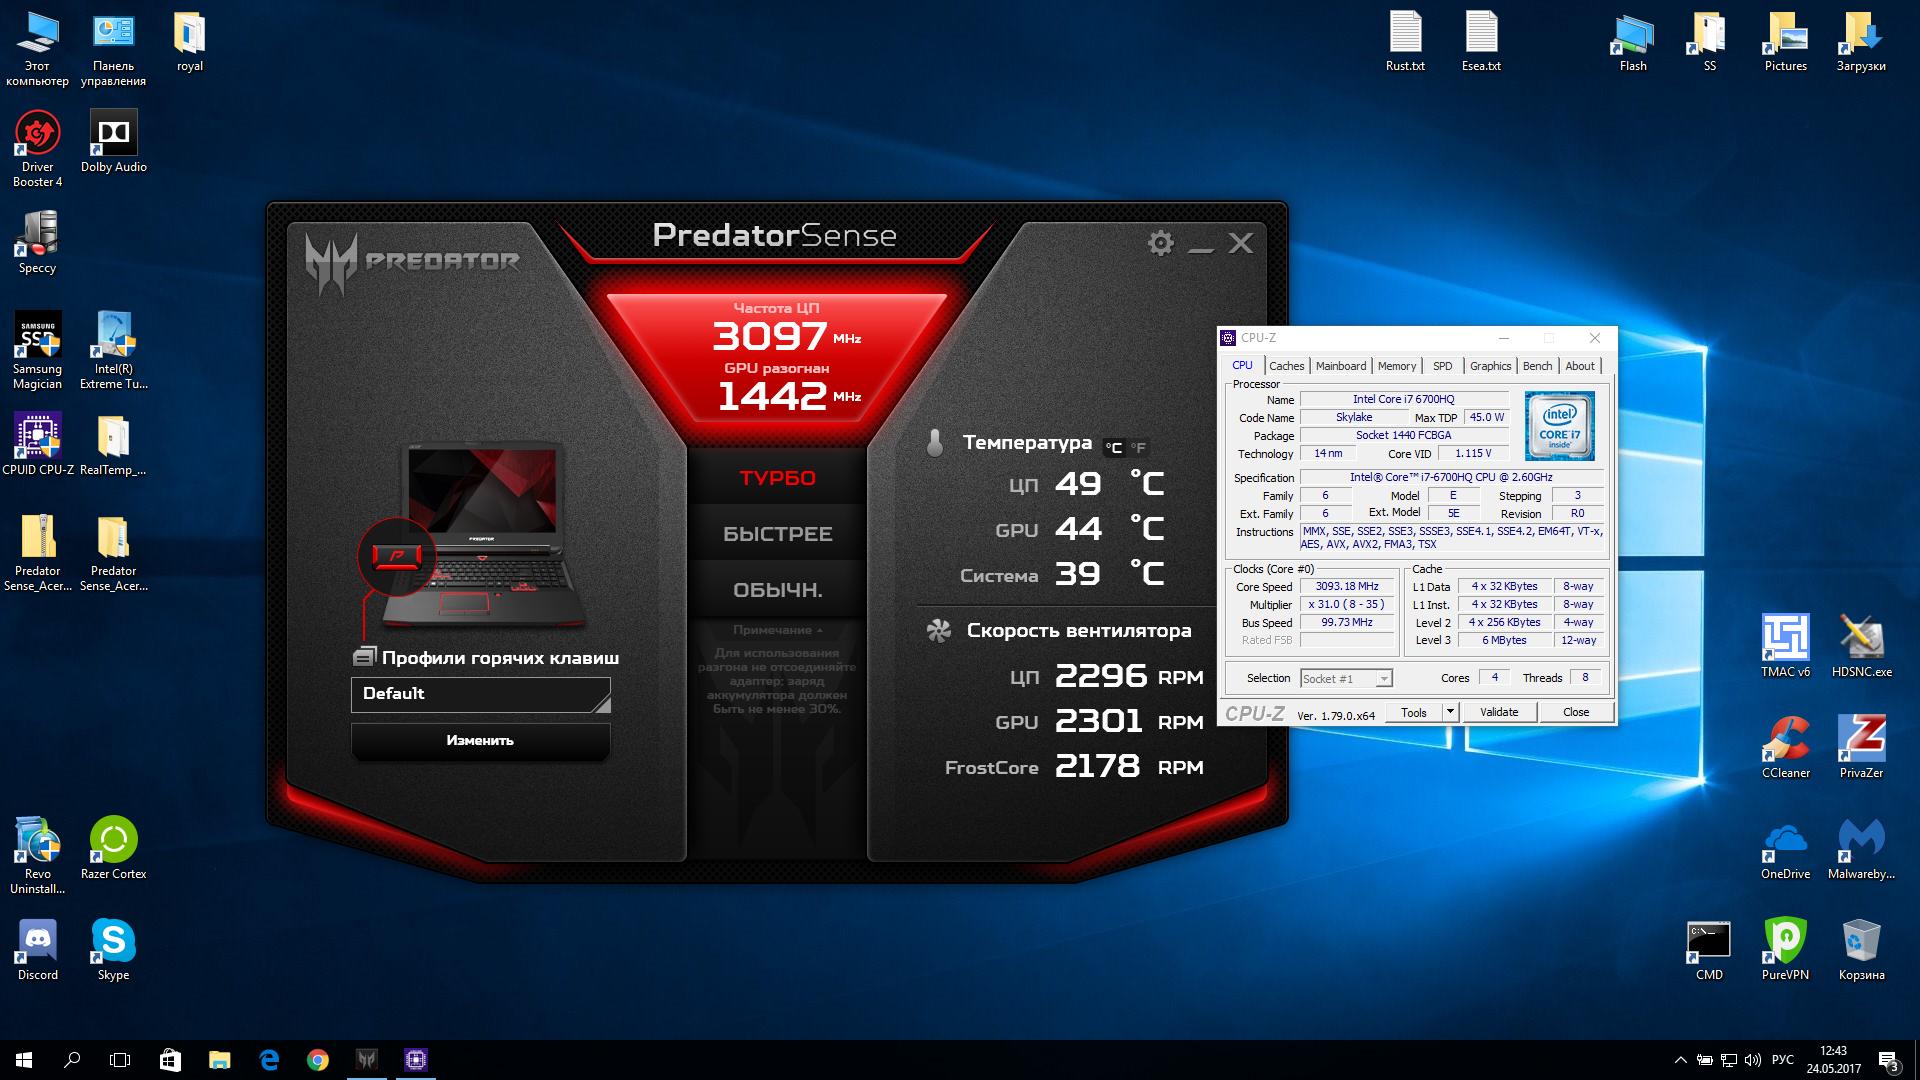 Acer Predator G9 793 Overclocking Community 2017 05 24 0b